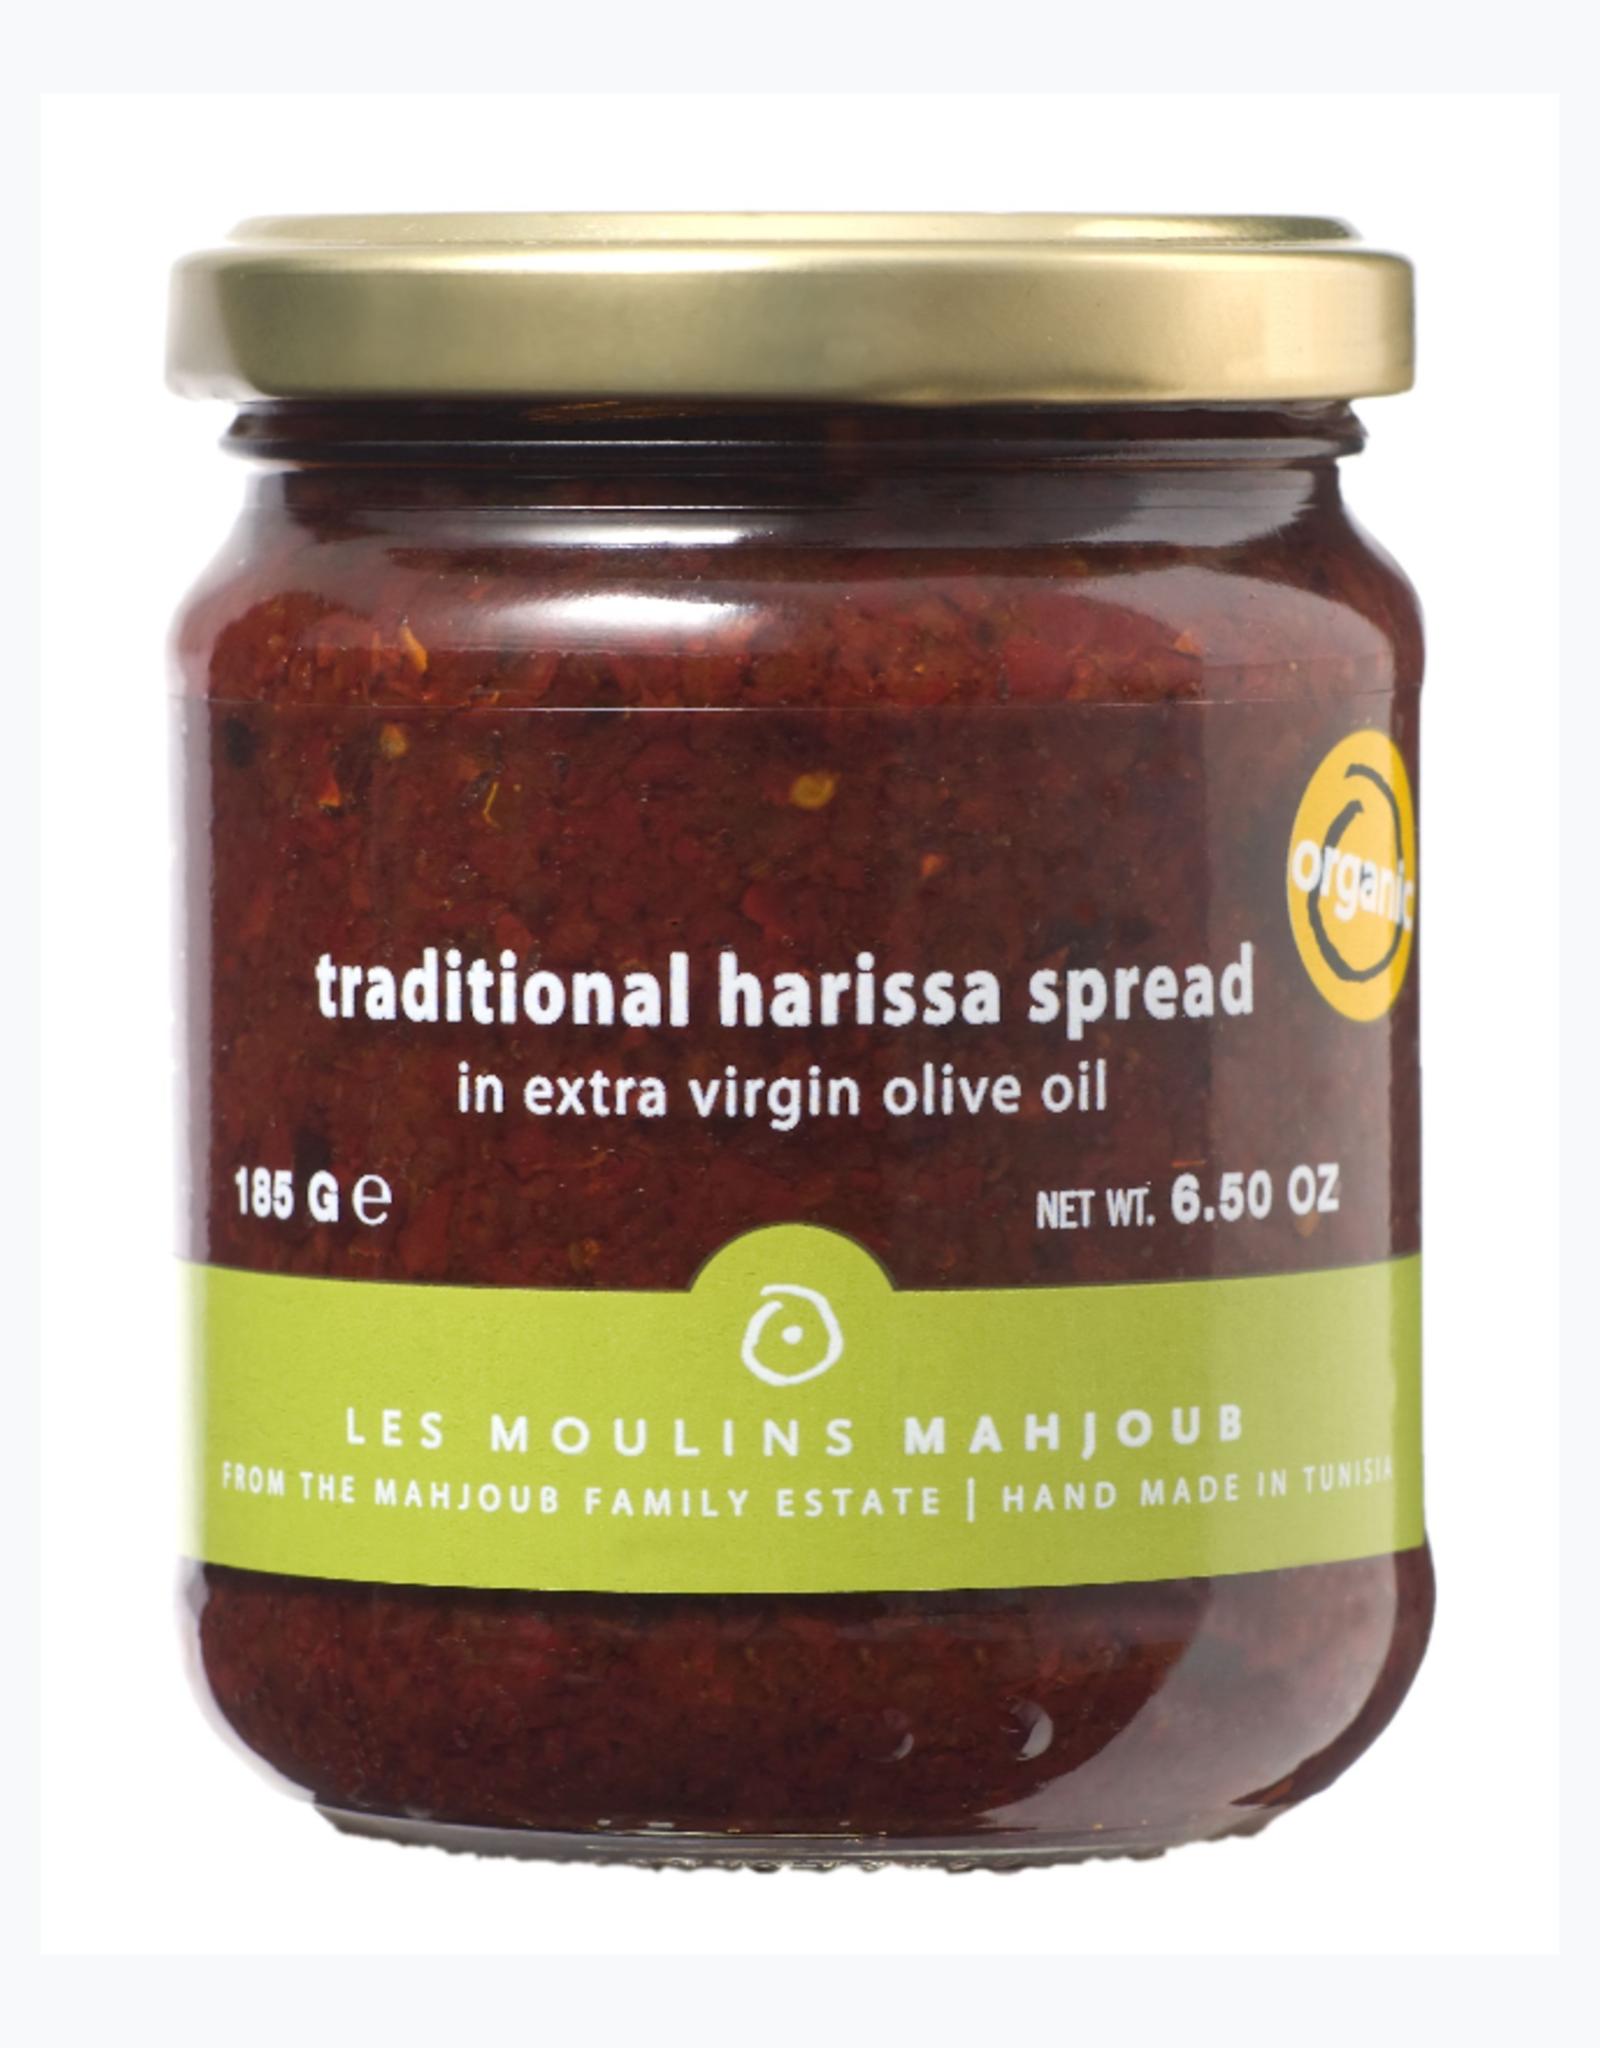 Great Ciao Harissa, Chaabani, Baklouti & Zina Peppers, Moulins Mahjoub, Tunisia, 185g